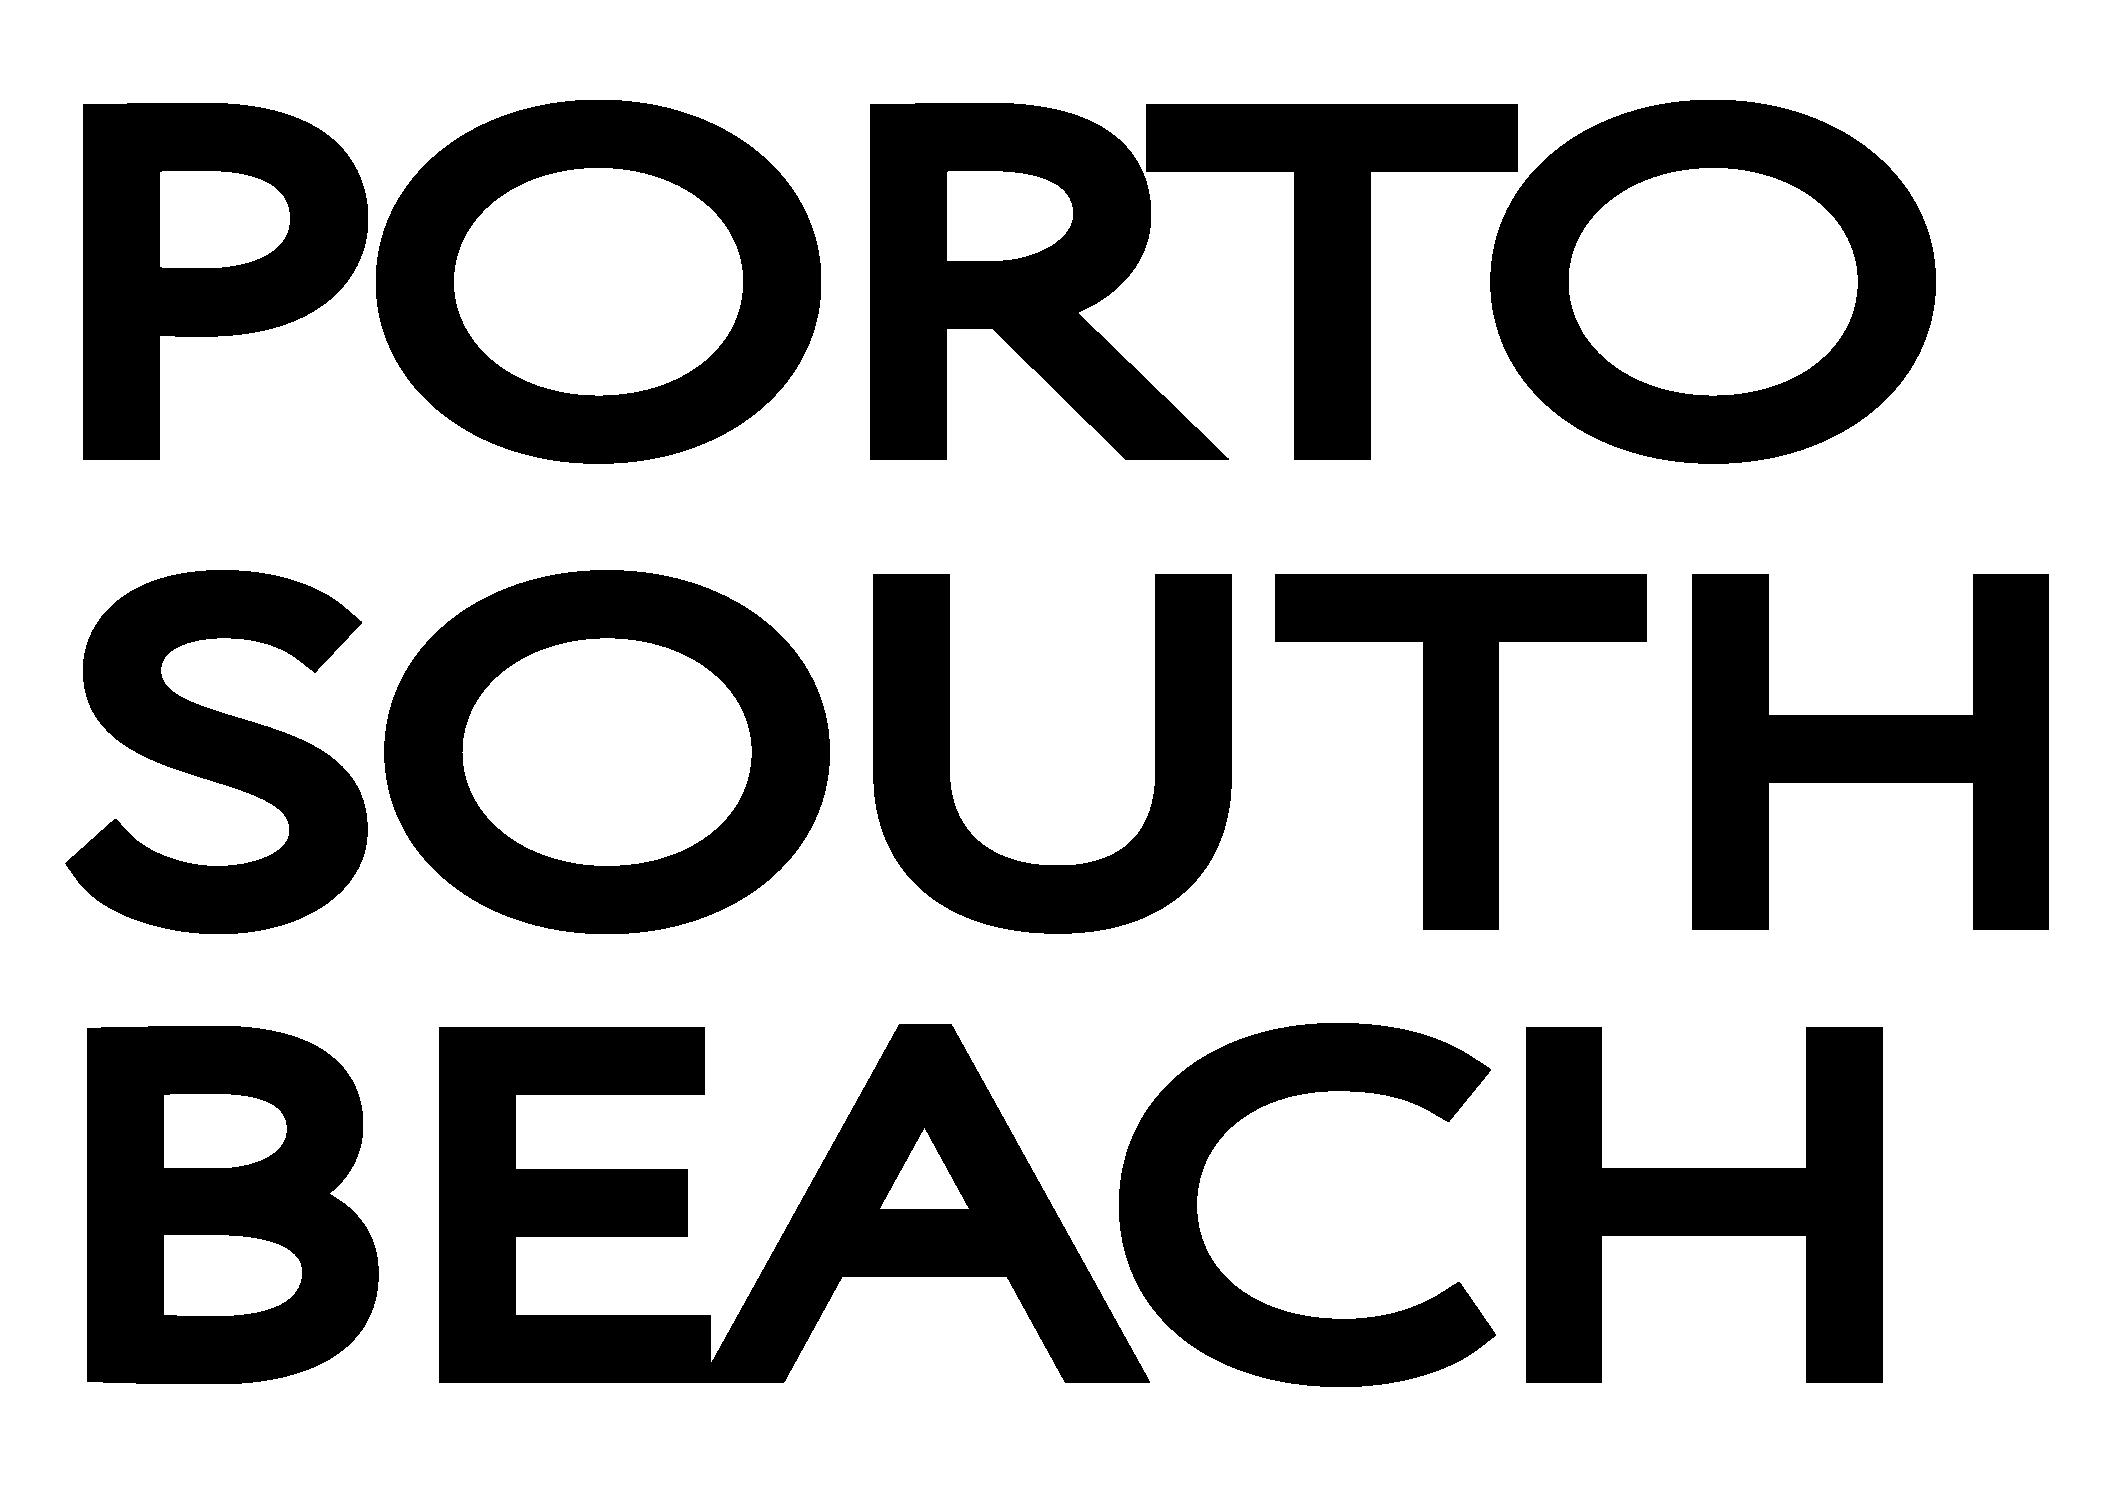 porto matrouh logo